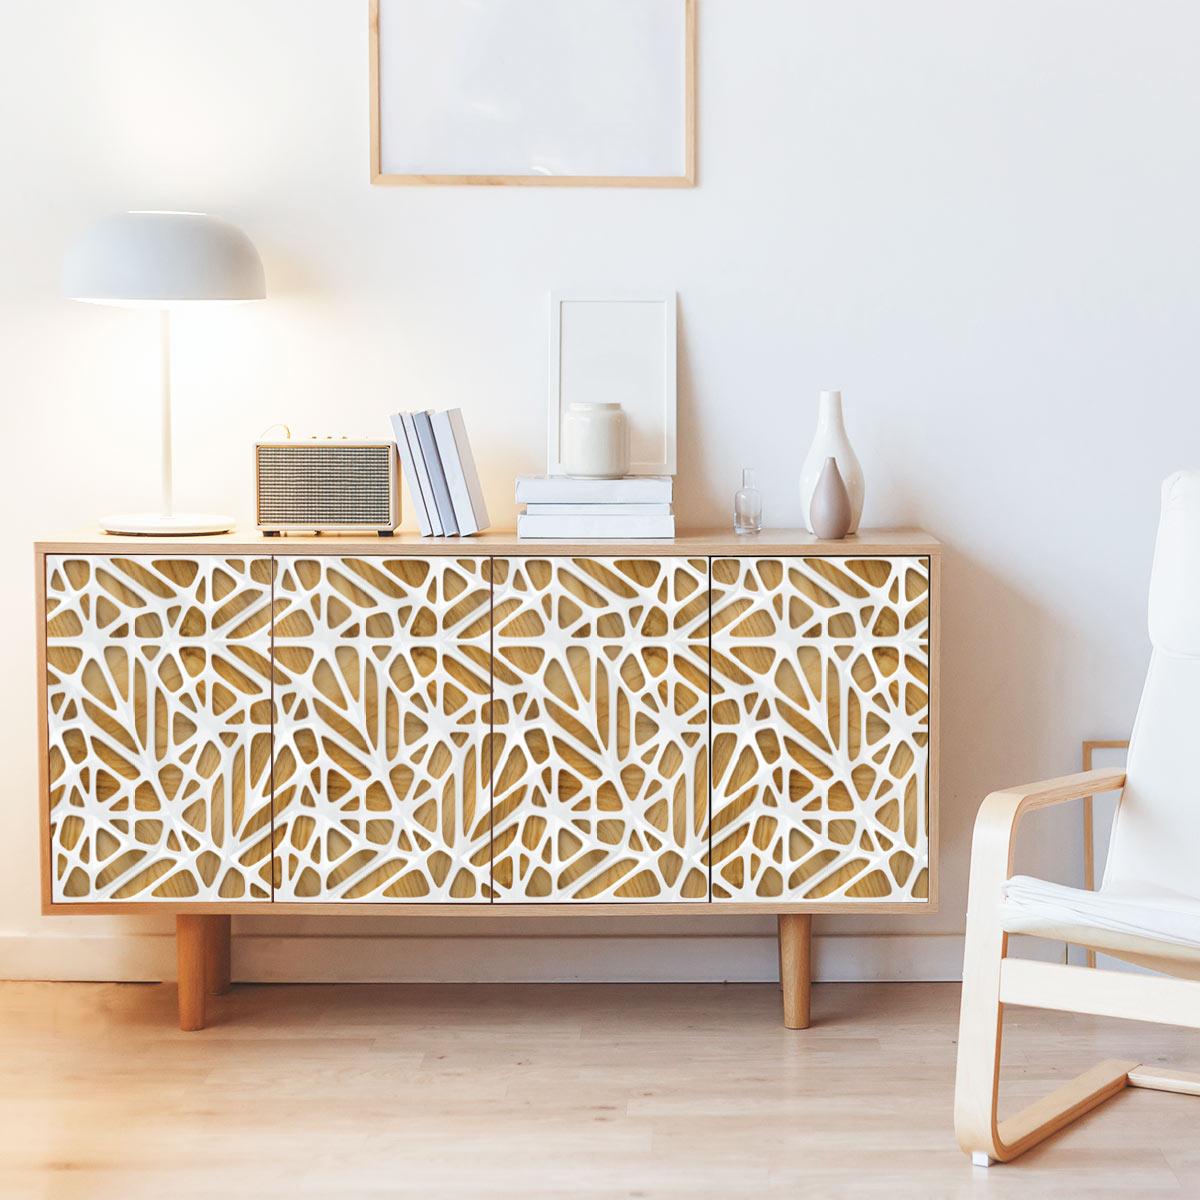 sticker meuble scandinave bois design blanc